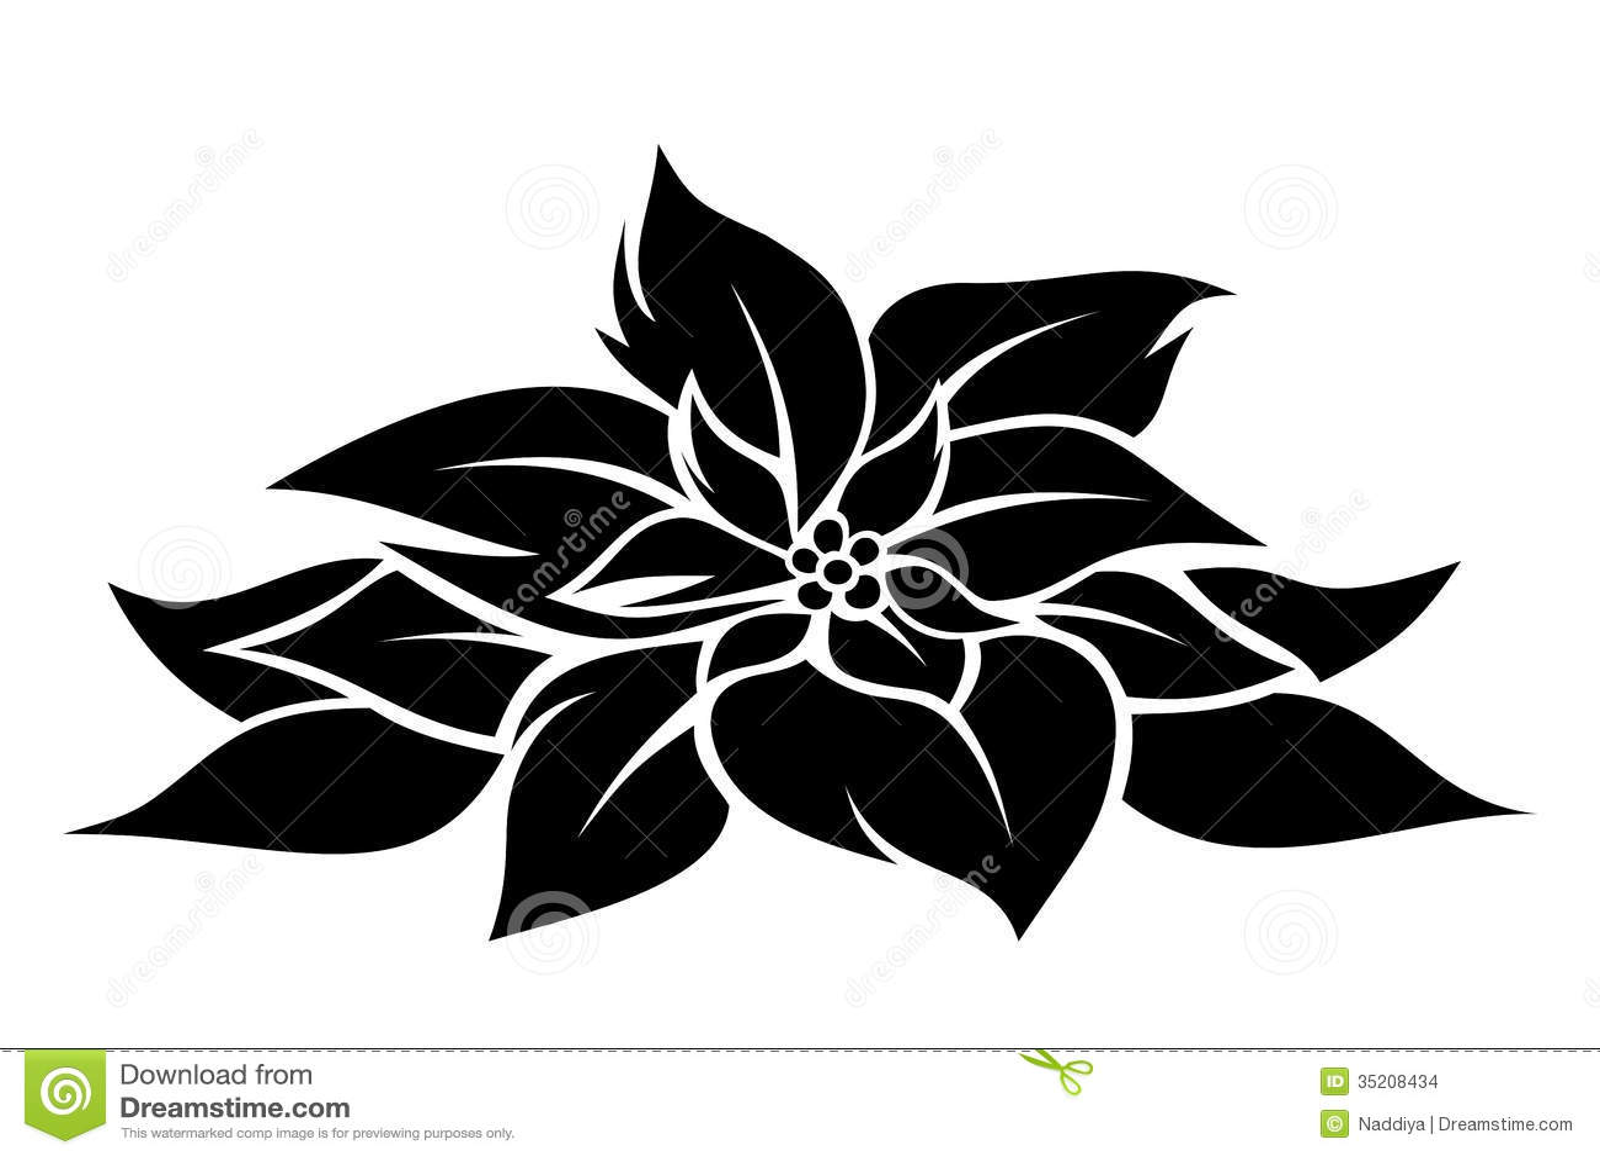 Black silhouette of Christmas poinsettia flower on a white background.